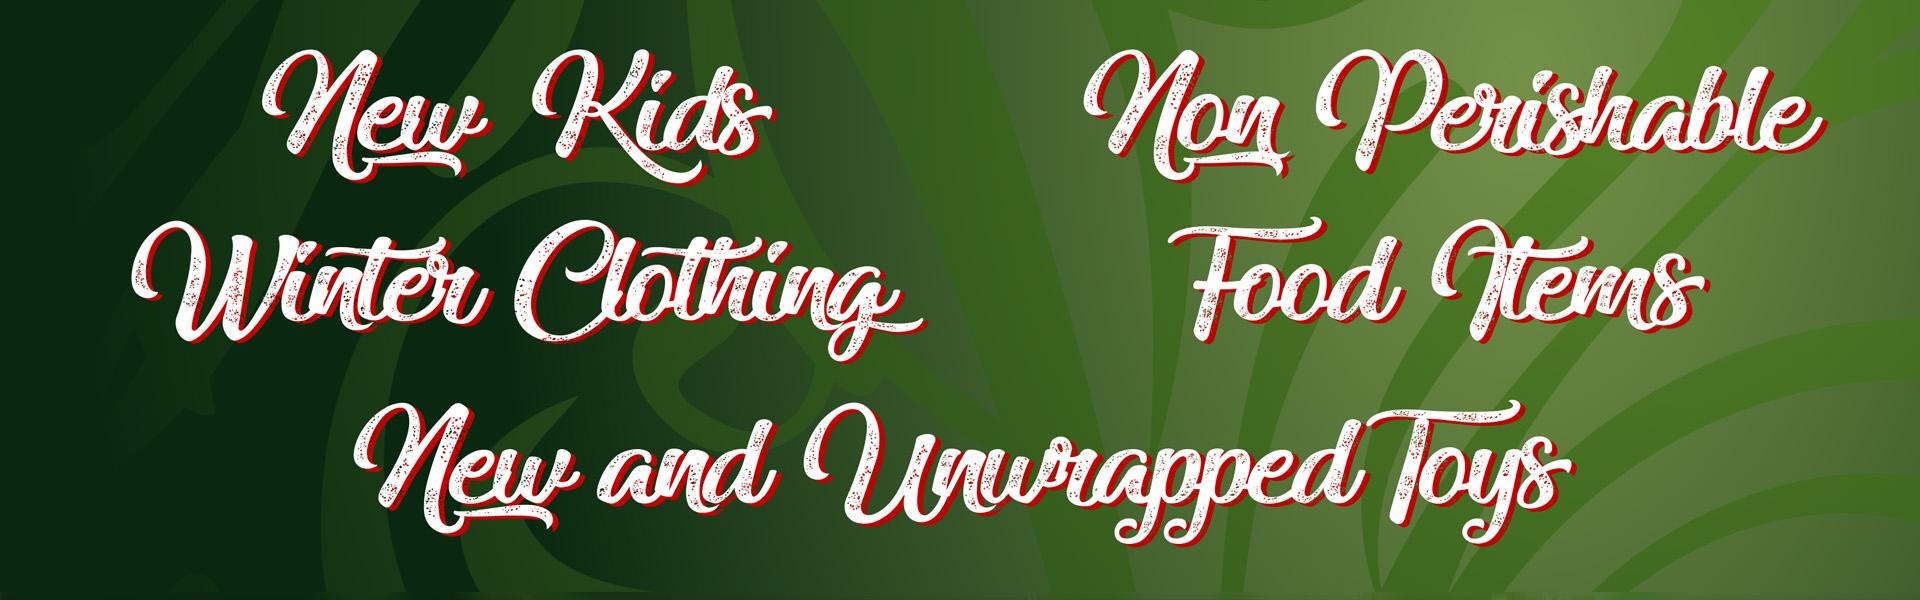 Findlay Forward: Holiday Food & Toy Drive